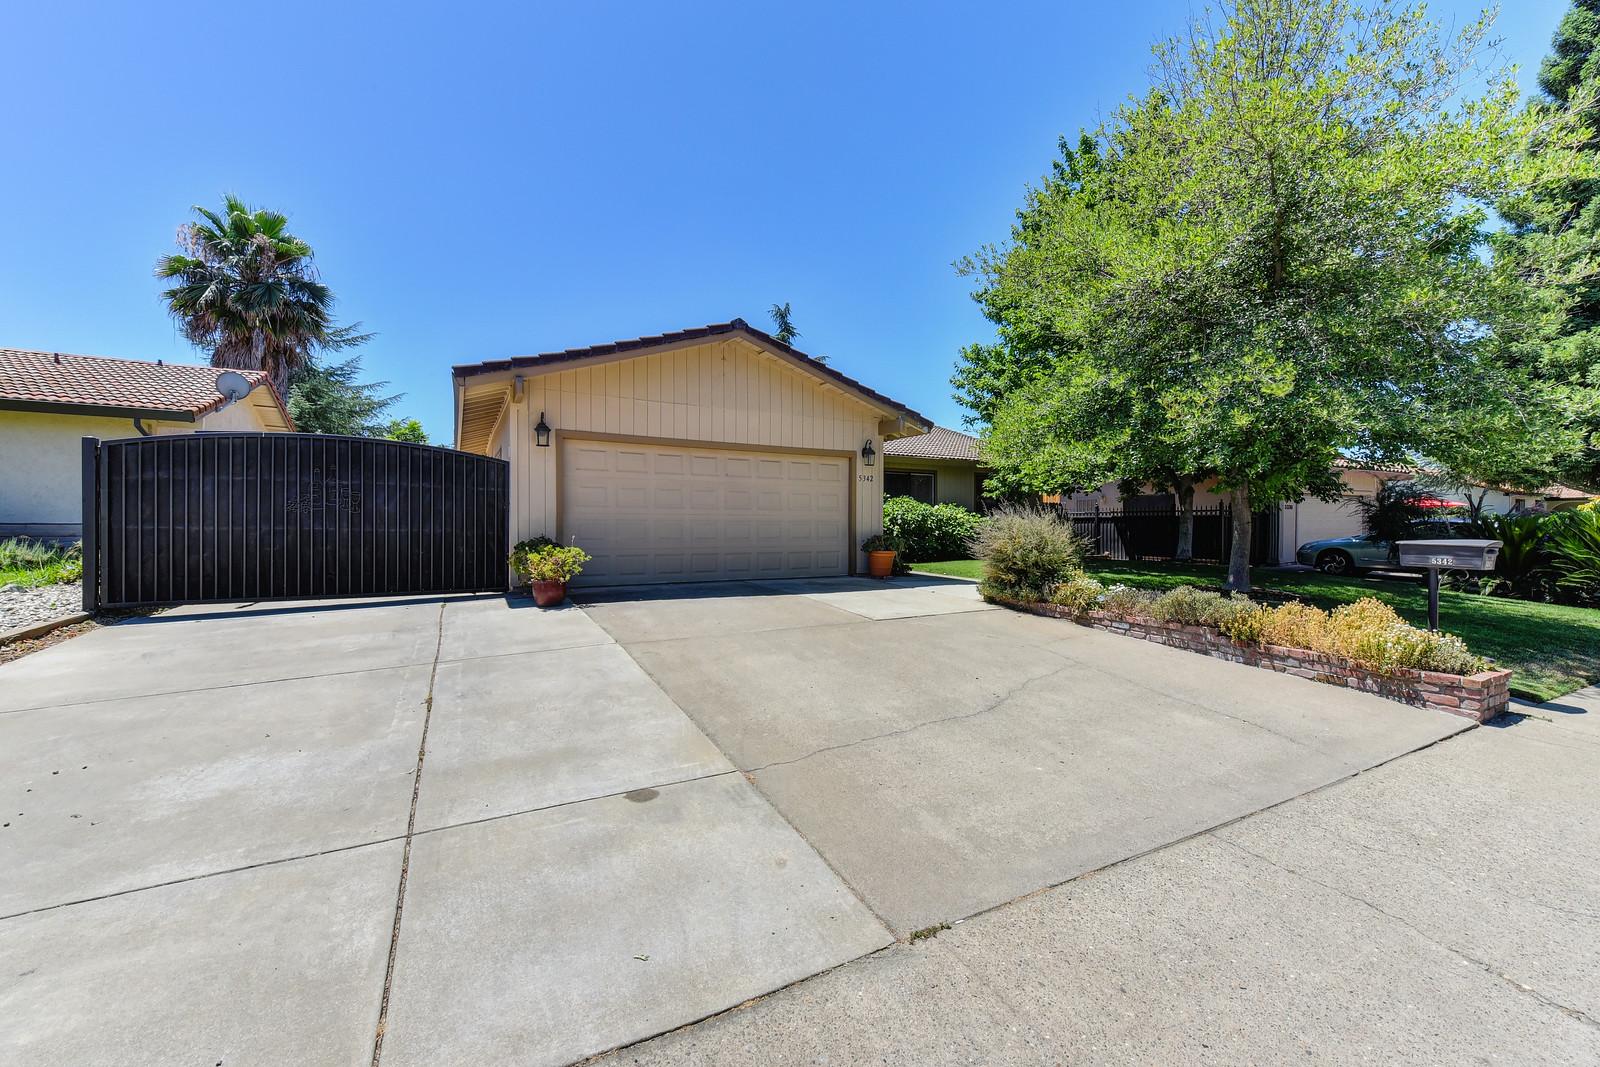 Carmicahel California real estate agent Jesse Coffey